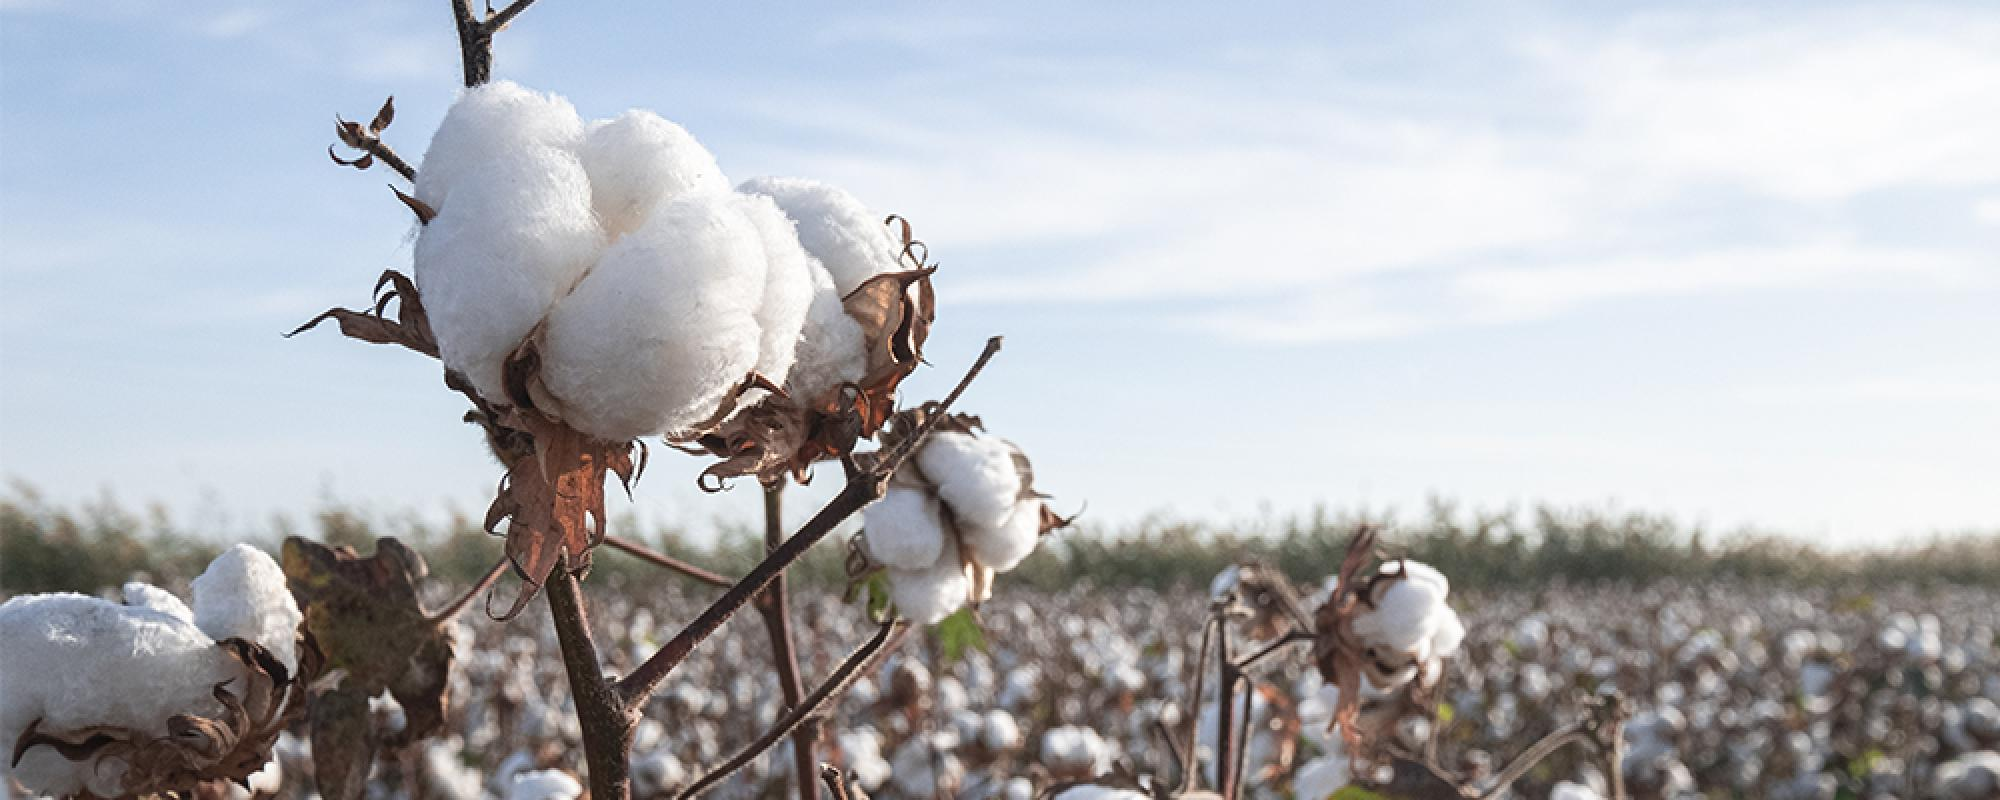 Photo of cotton field